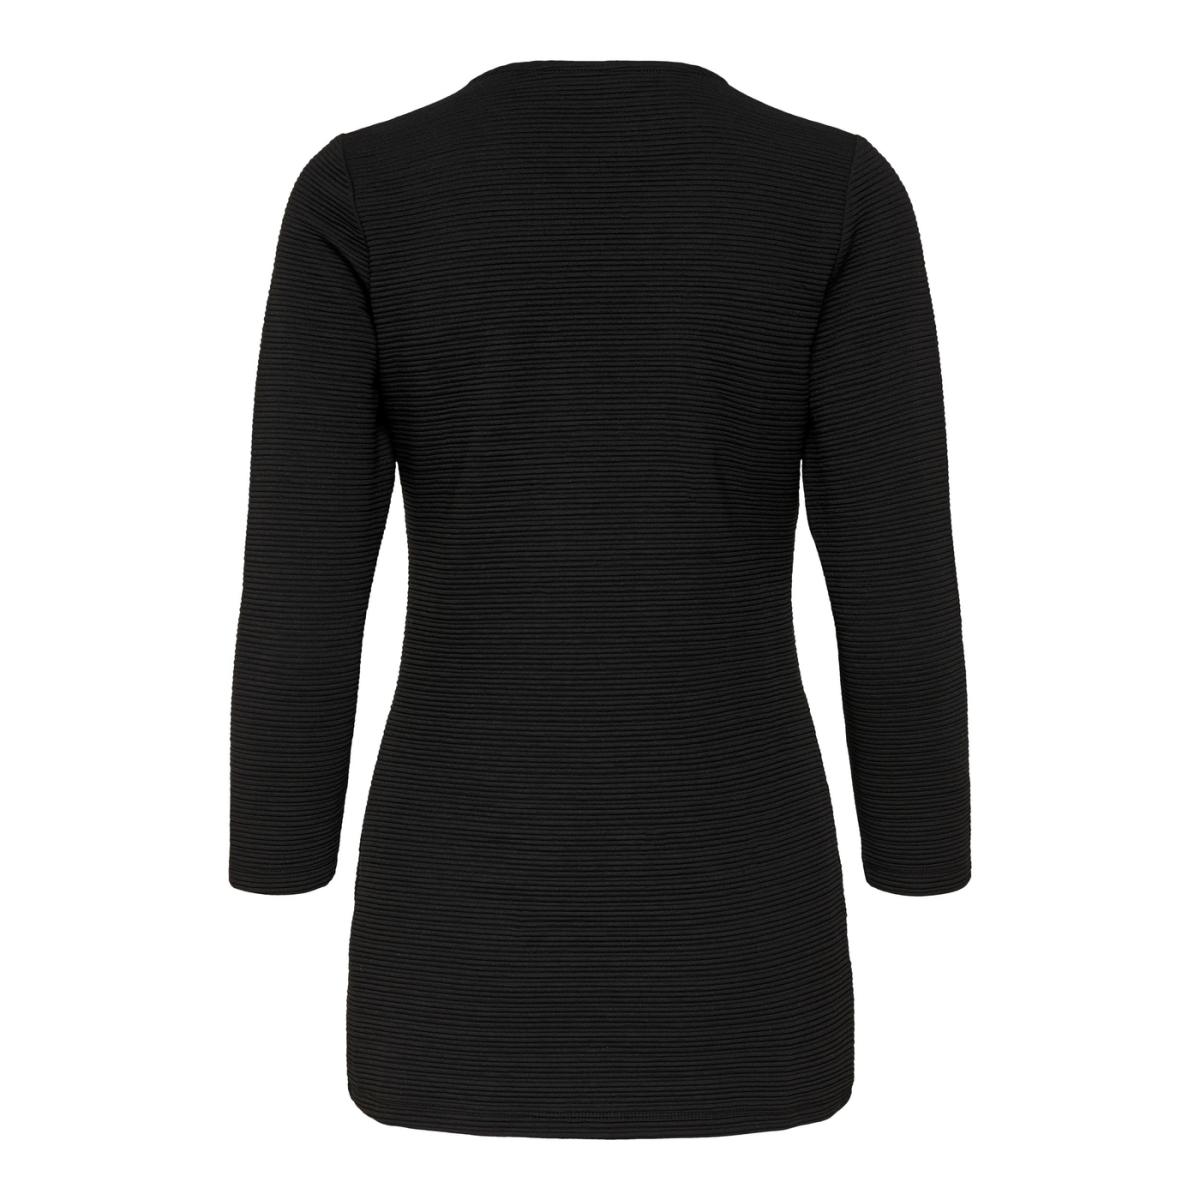 onlleco 7/8 long cardigan 15112273 - 2 only vest black